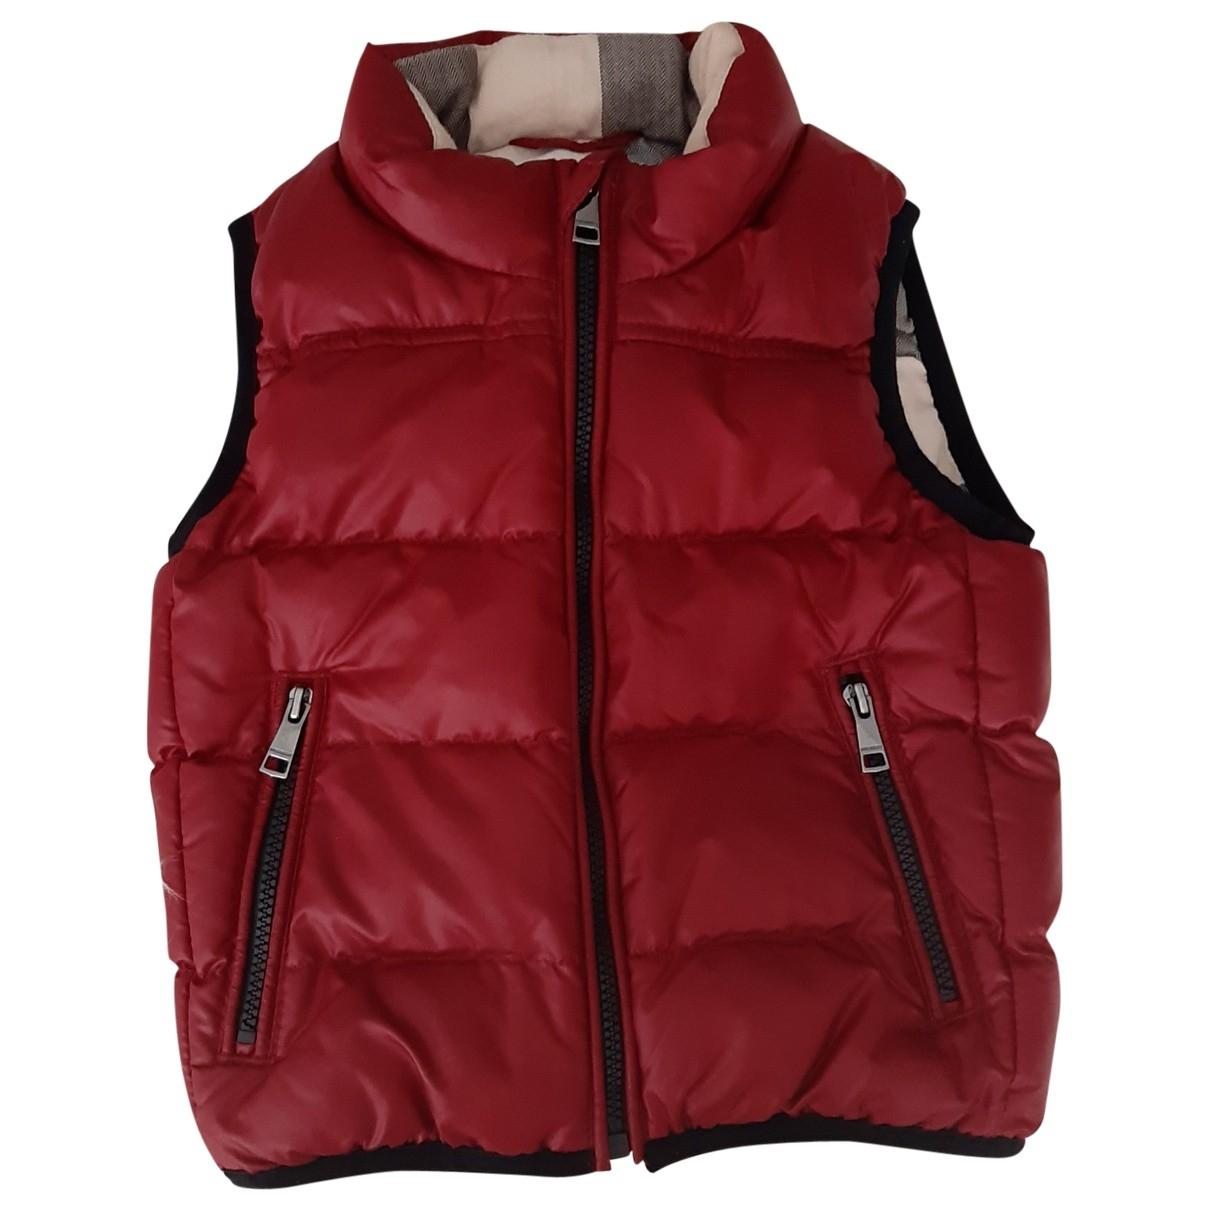 Burberry \N Burgundy Cotton jacket & coat for Kids 9 months - up to 71cm FR